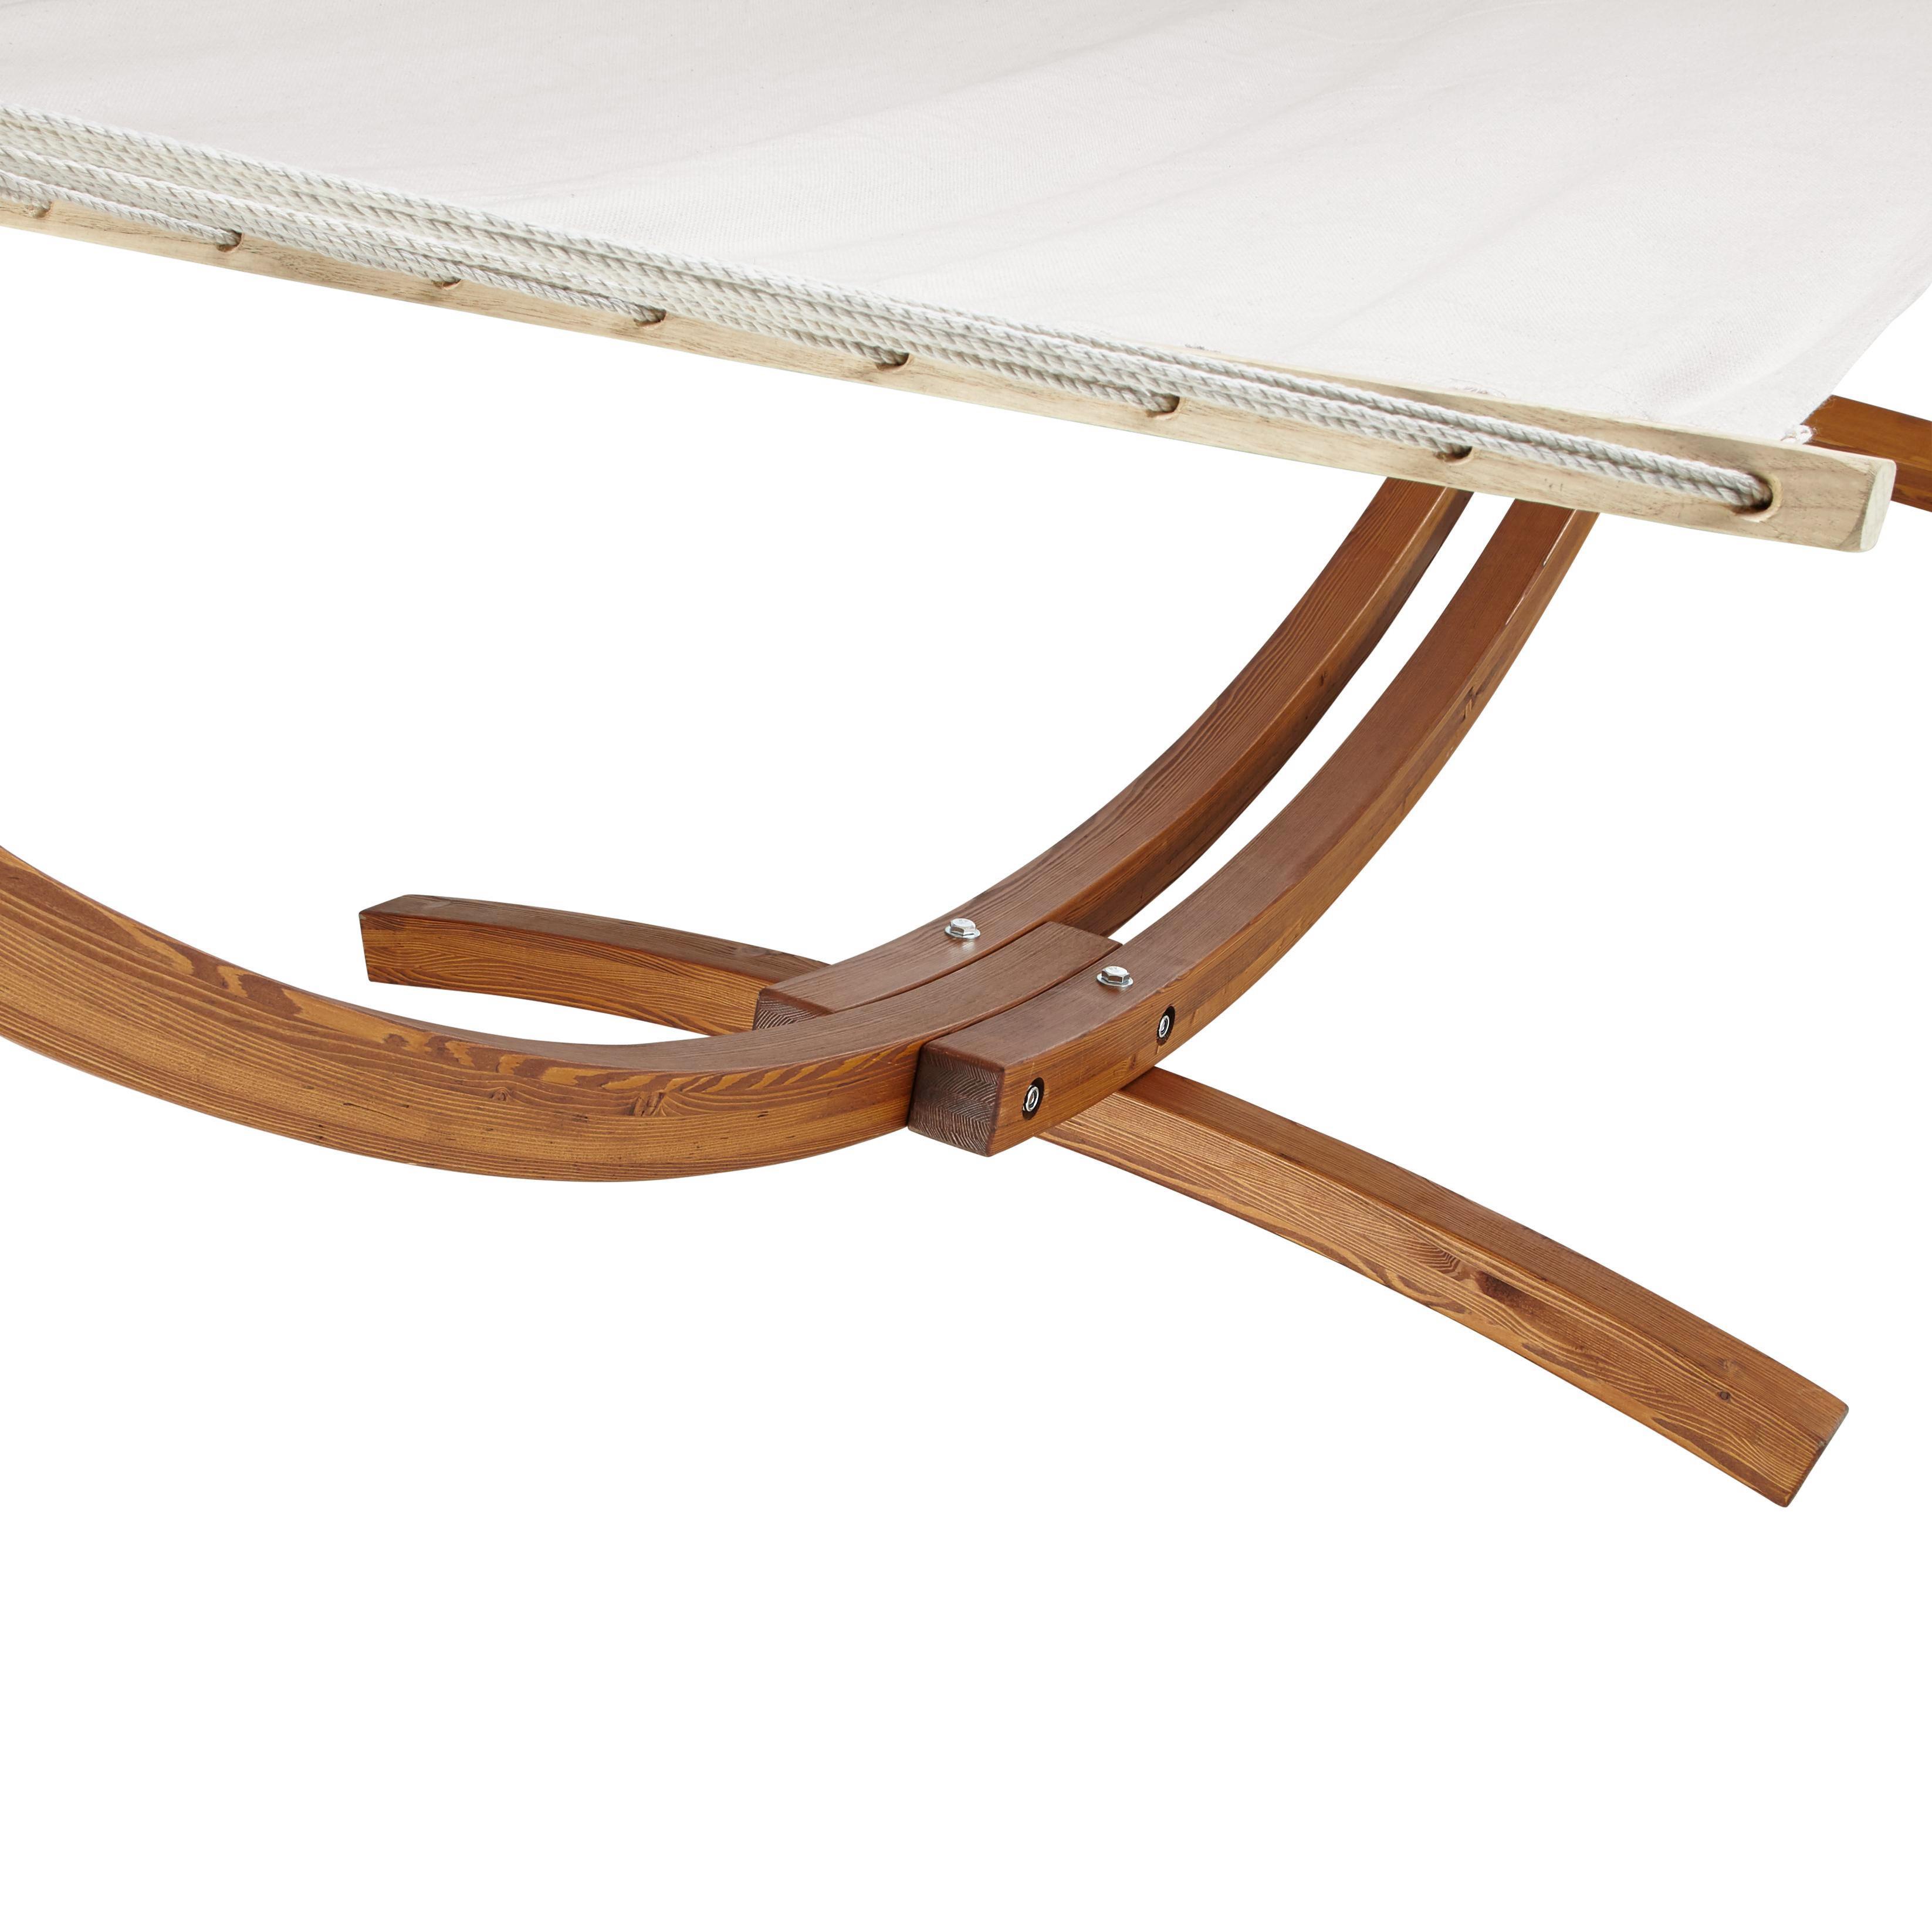 Hängematte Ciara - Beige/Braun, MODERN, Holz/Textil (312/119/123cm) - MÖMAX modern living